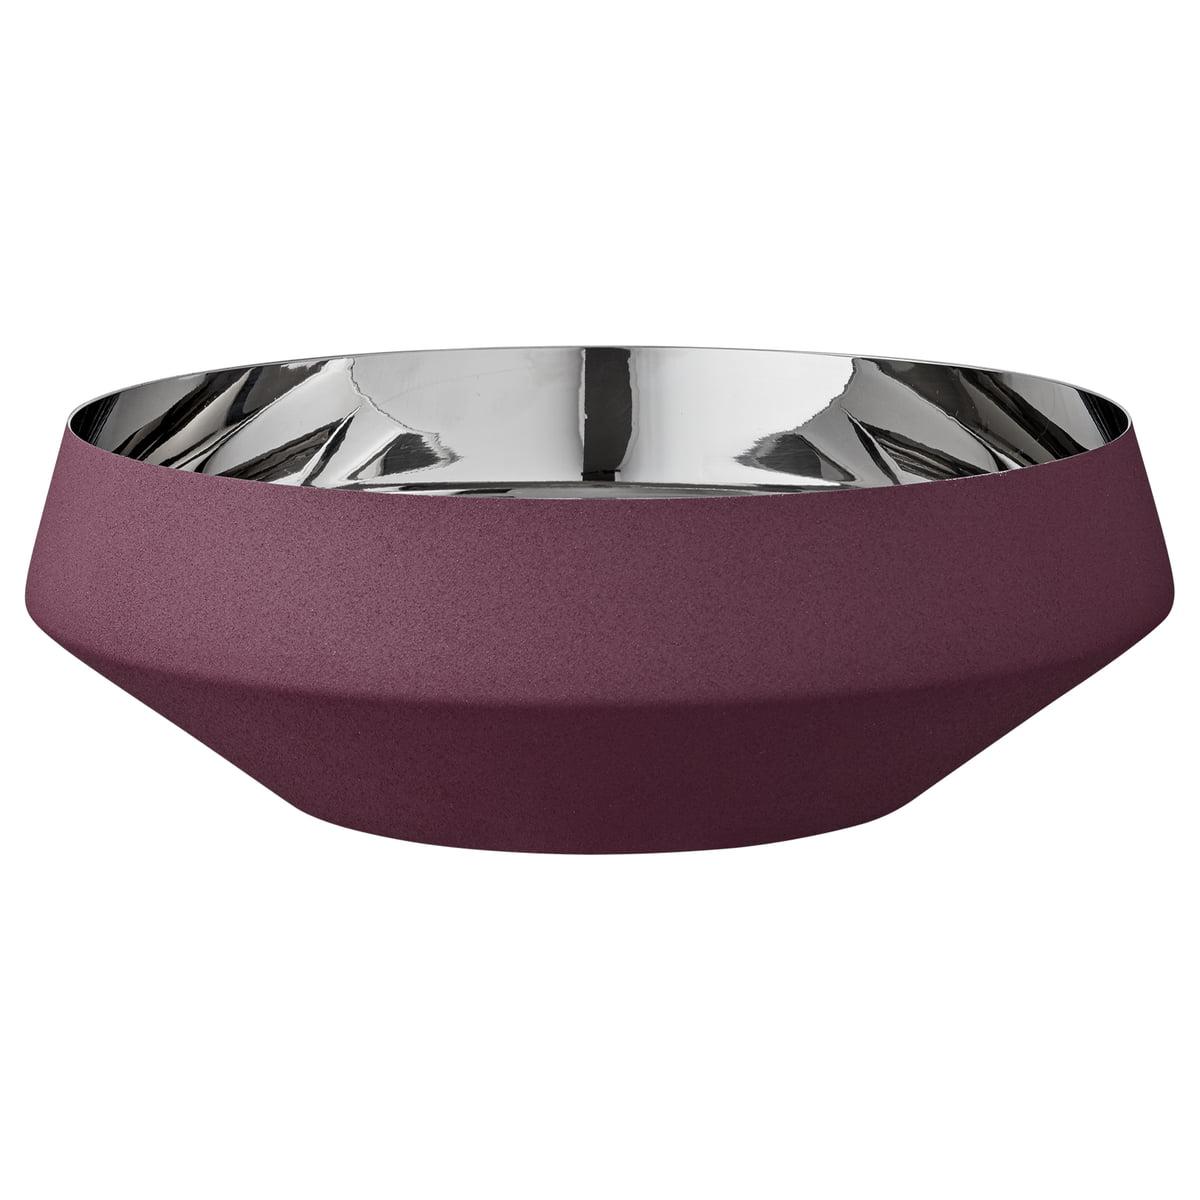 AYTM - Lucea Schale extra large, Ø 34,5 x H 9,6 cm, bordeaux   Dekoration > Aufbewahrung und Ordnung   Bordeauxrot   AYTM